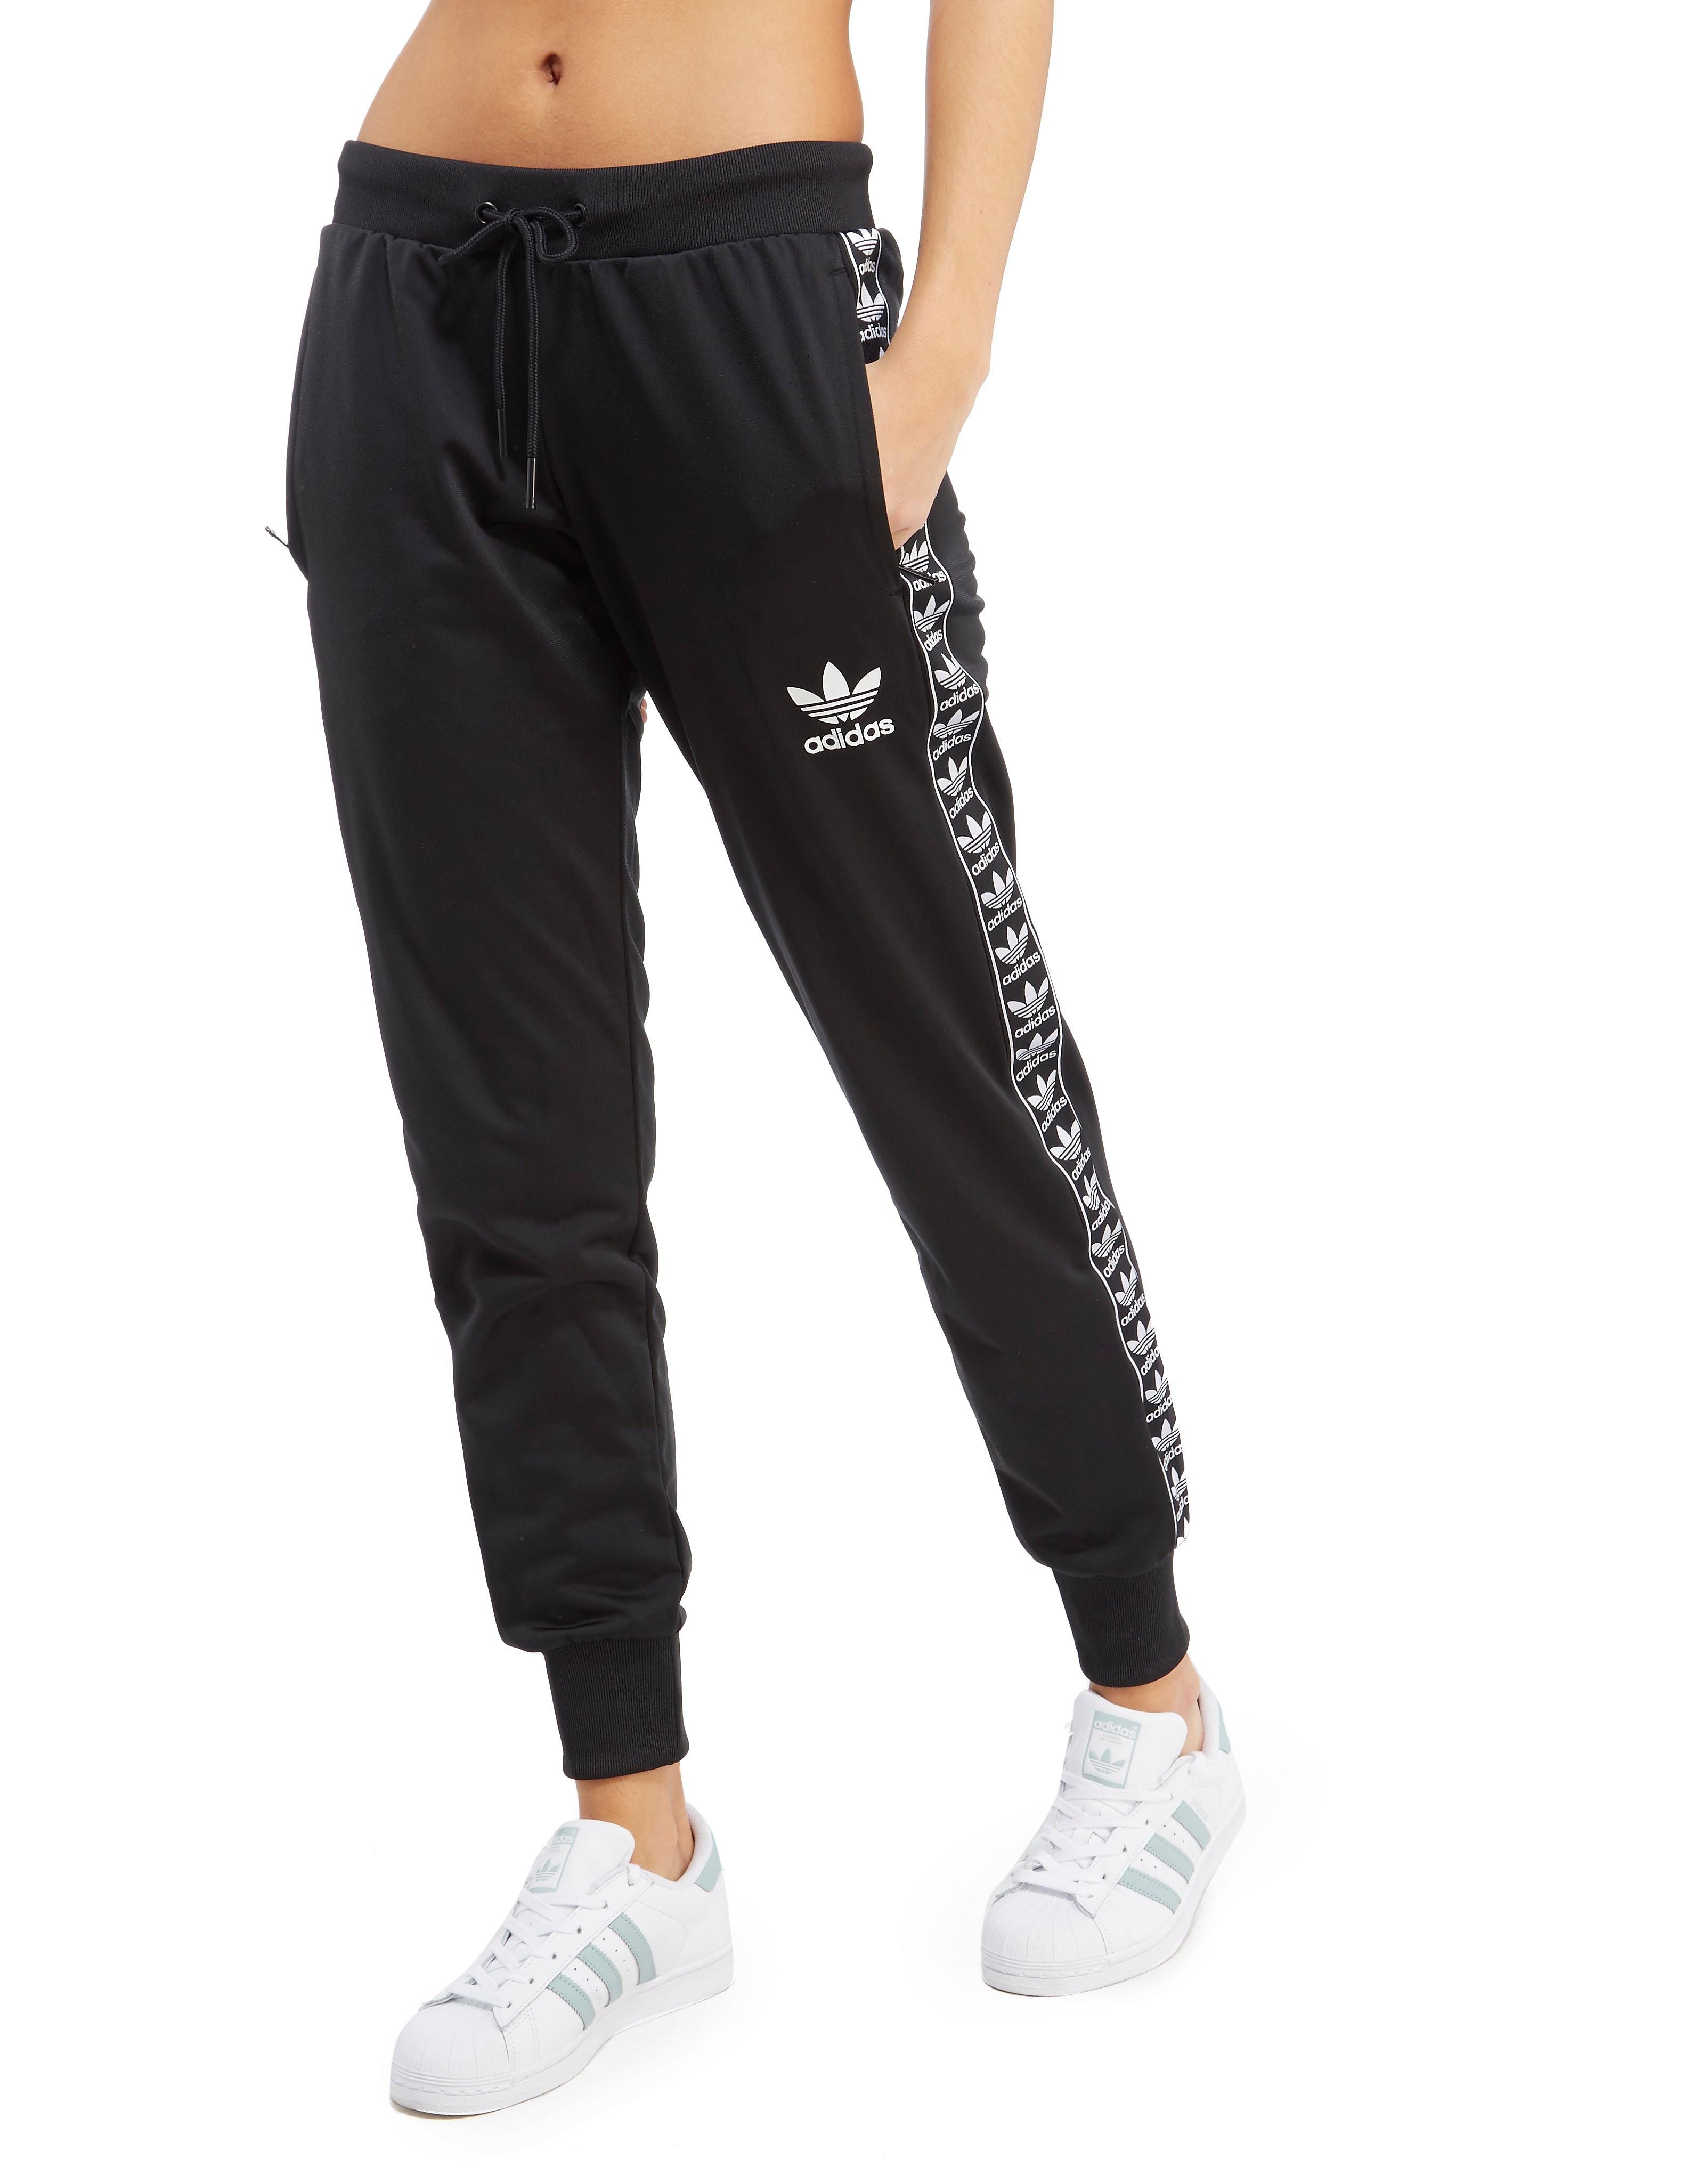 adidas Originals Firebird Tape Track Pants